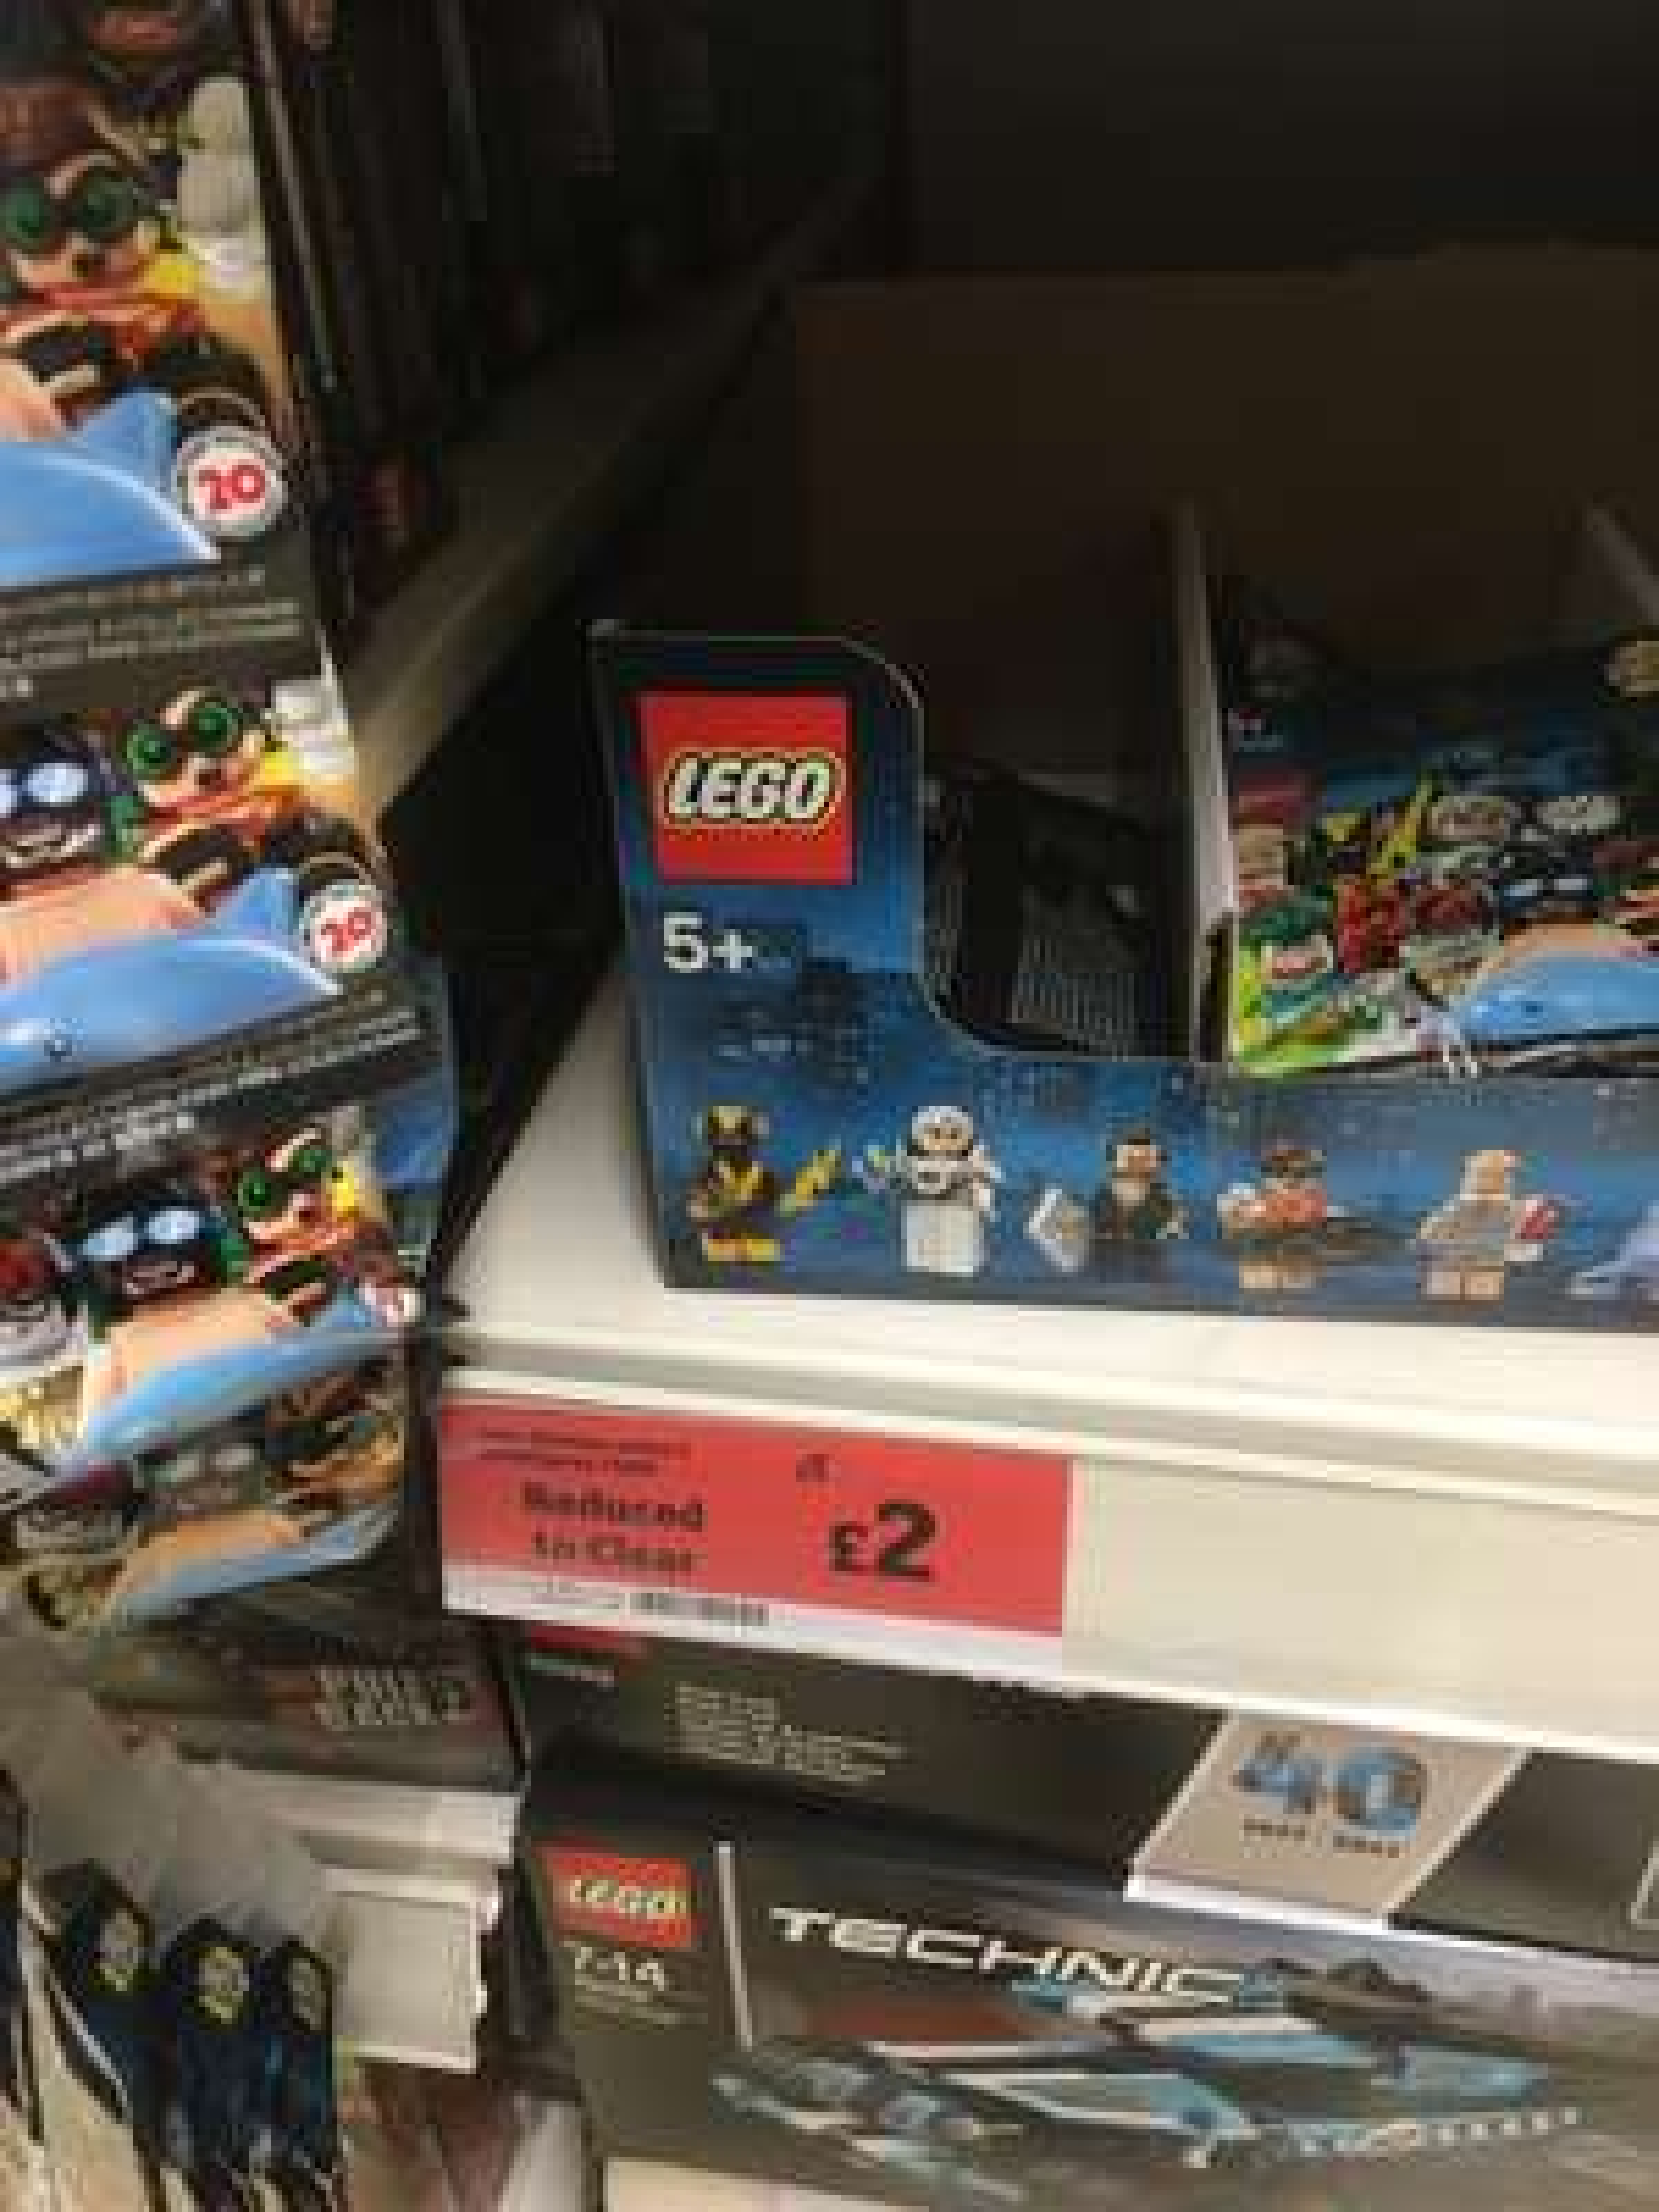 Lego Batman Movie Series 2 minifigures (71020) reduced to £2 - in store Sainsburys (York)